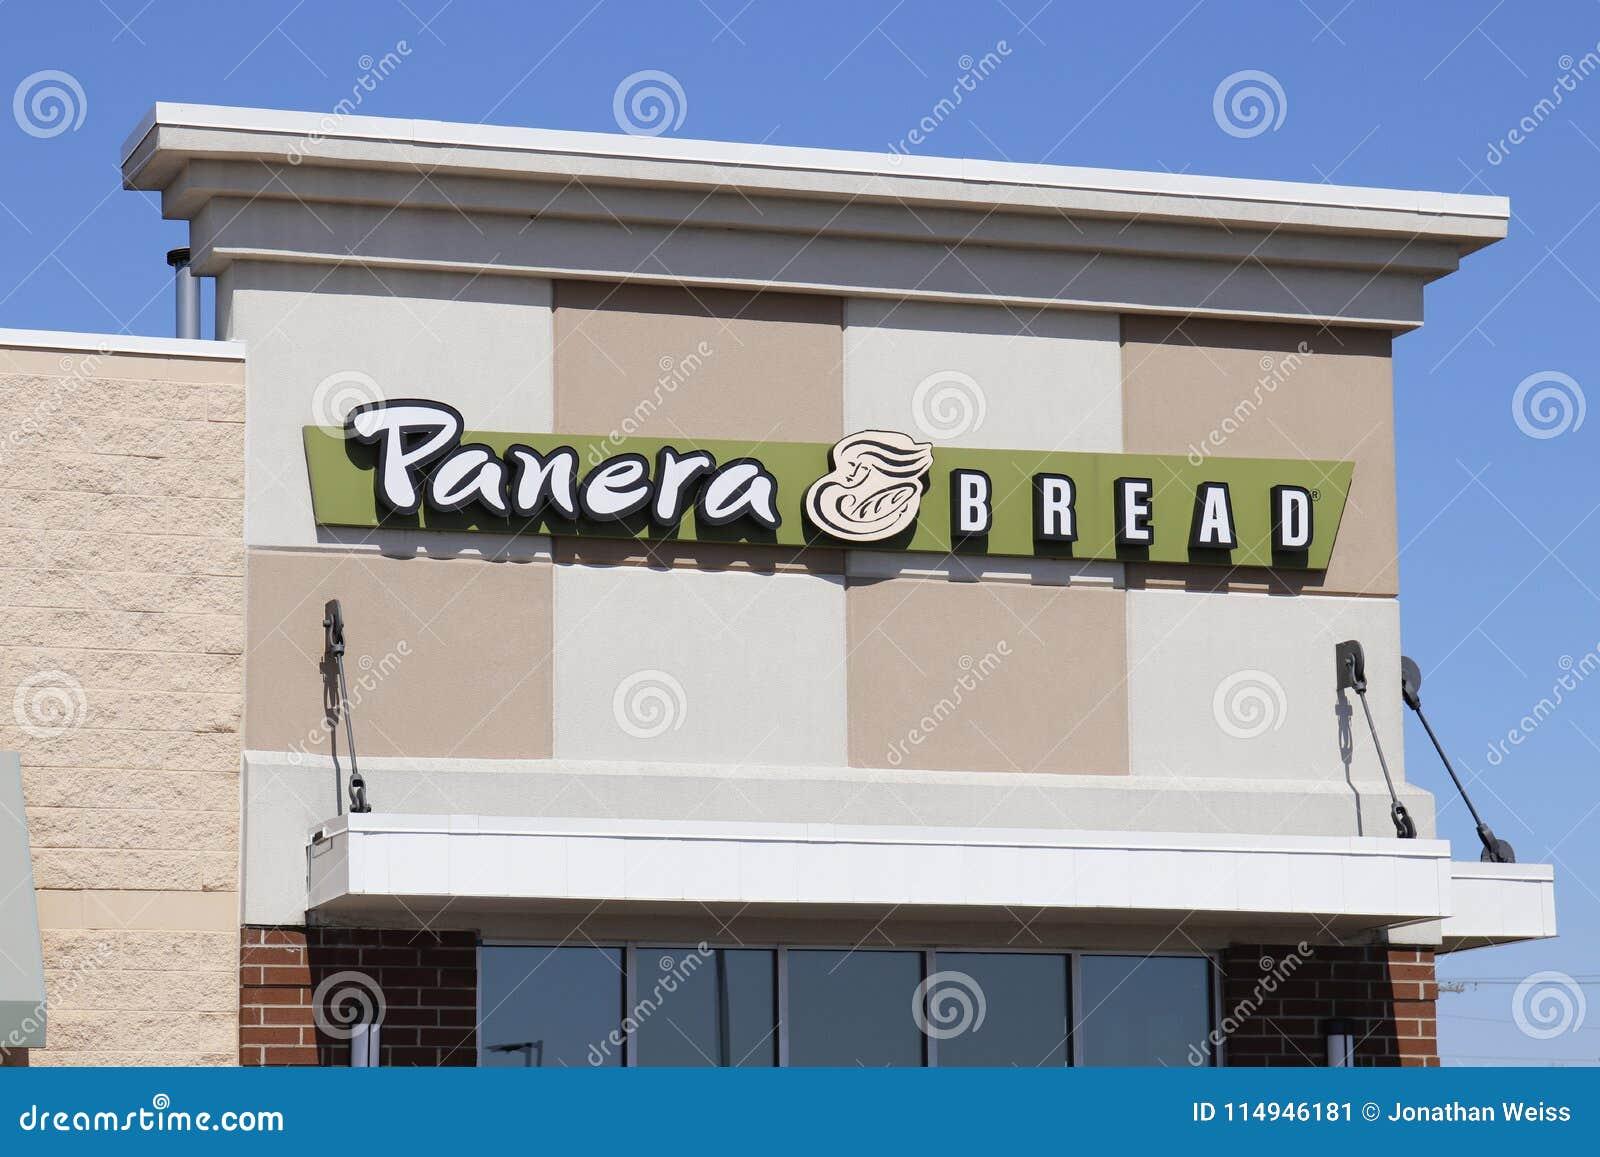 Appealing Panera Bread 33316 Ideas - Best Image Engine - tagranks.com